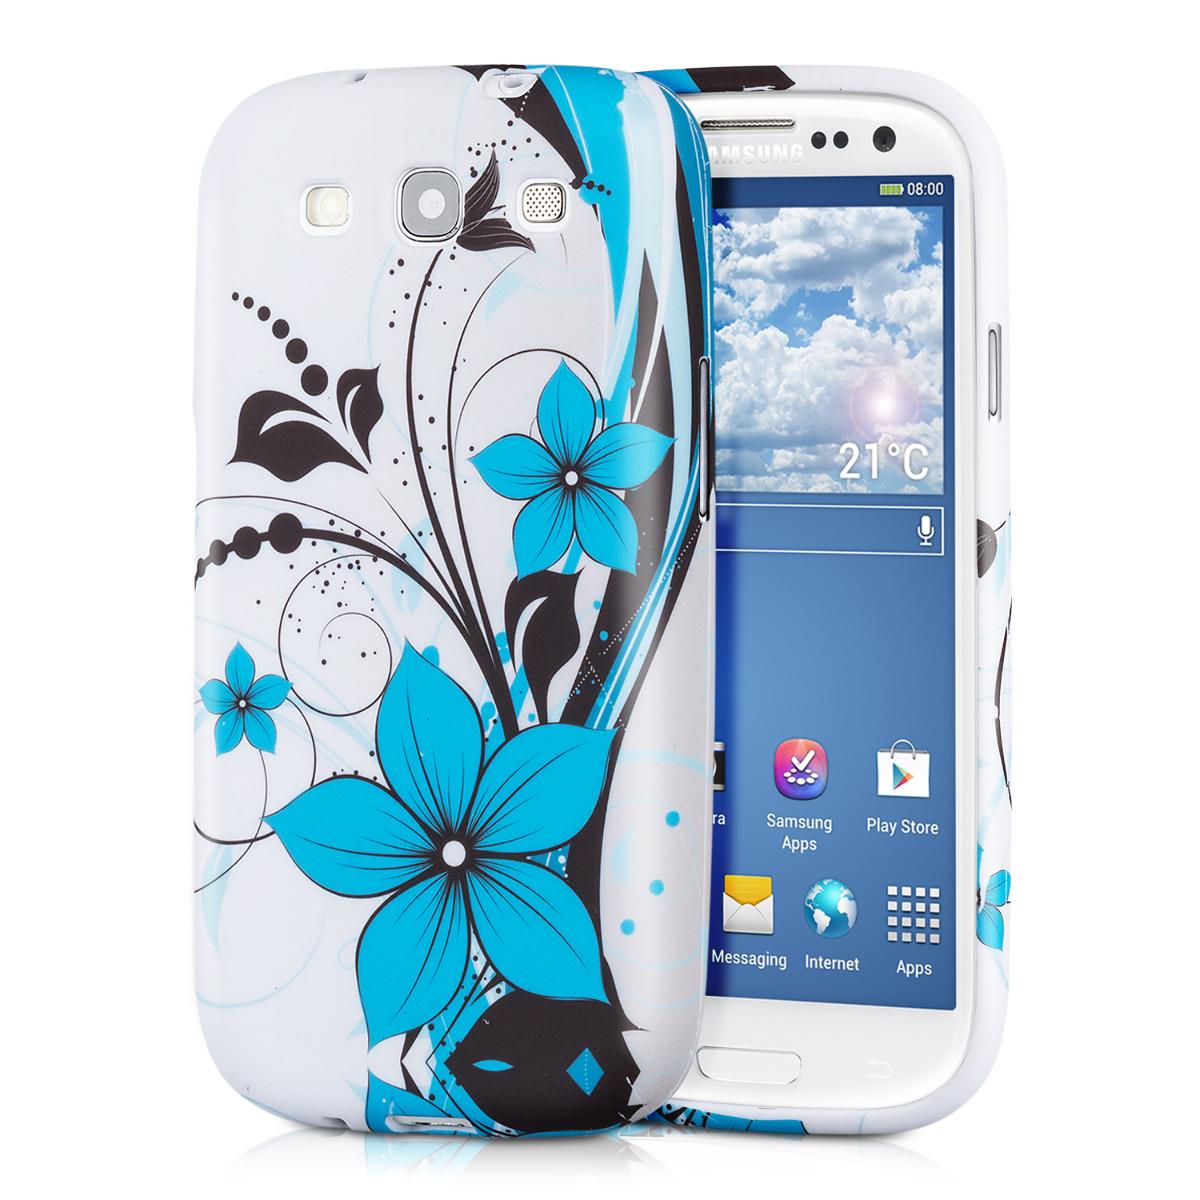 Tpu samsung galaxy s3 s3 neo - Tpu Silicone Case For Samsung Galaxy S3 S3